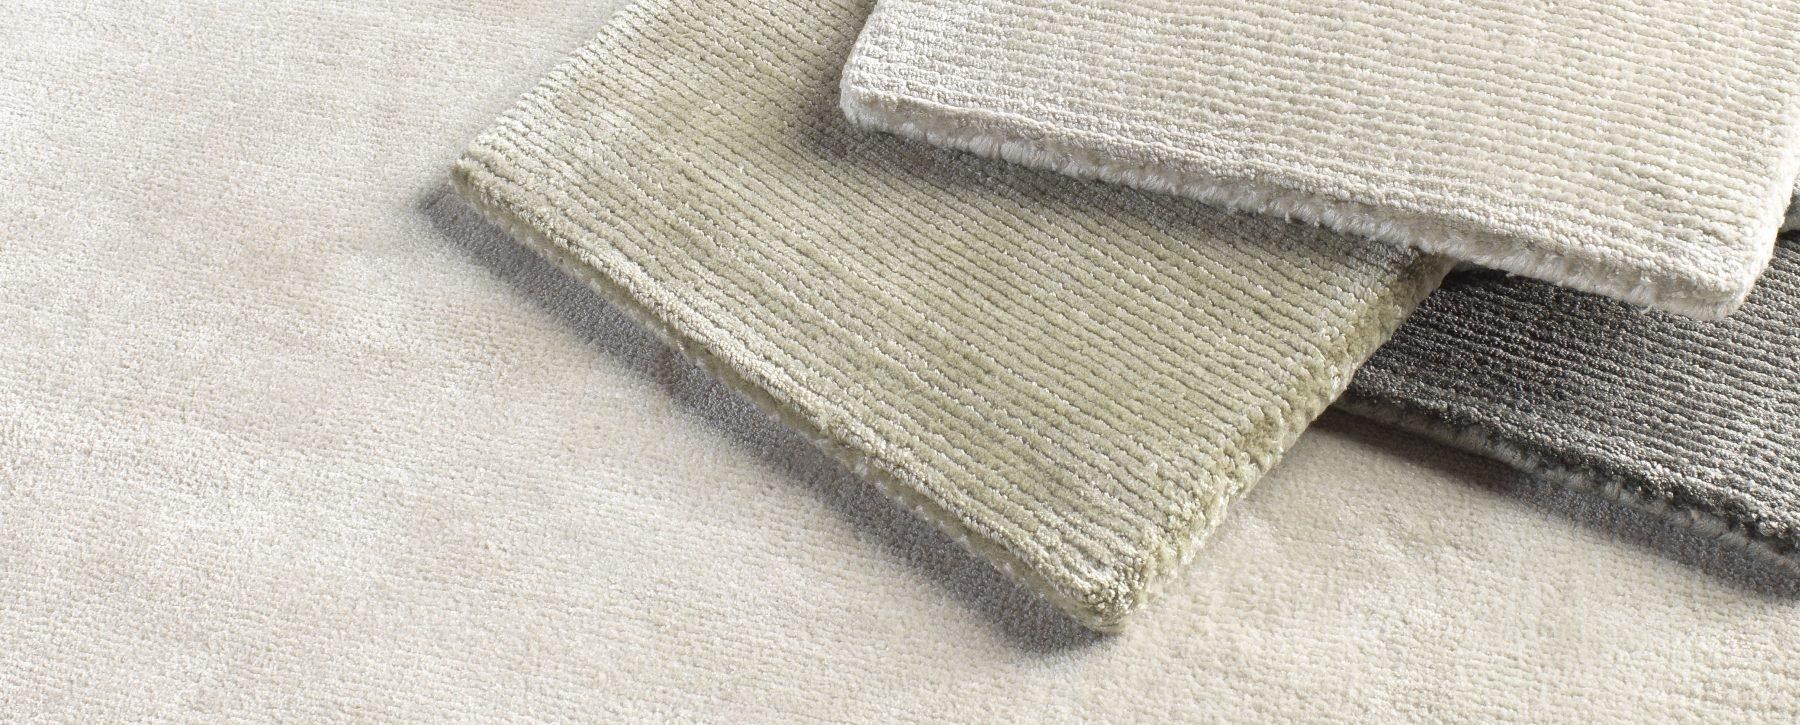 Care For Tencel Amp Viscose Jacaranda Carpets Amp Rugs